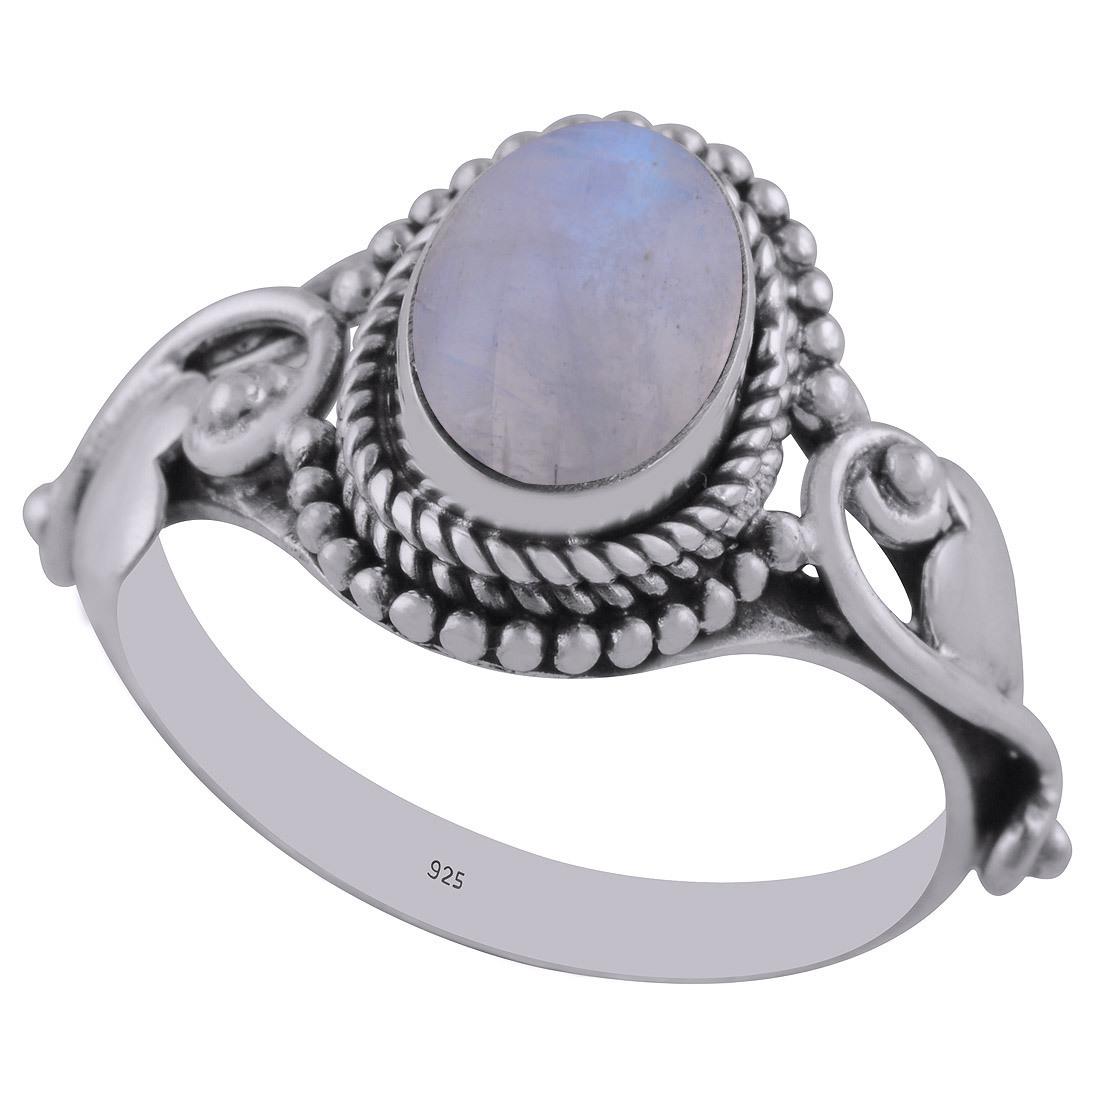 Tiger Eye Natural Gemstone 925 Sterling Solid Silver Oval Cabochon Handmade Ring